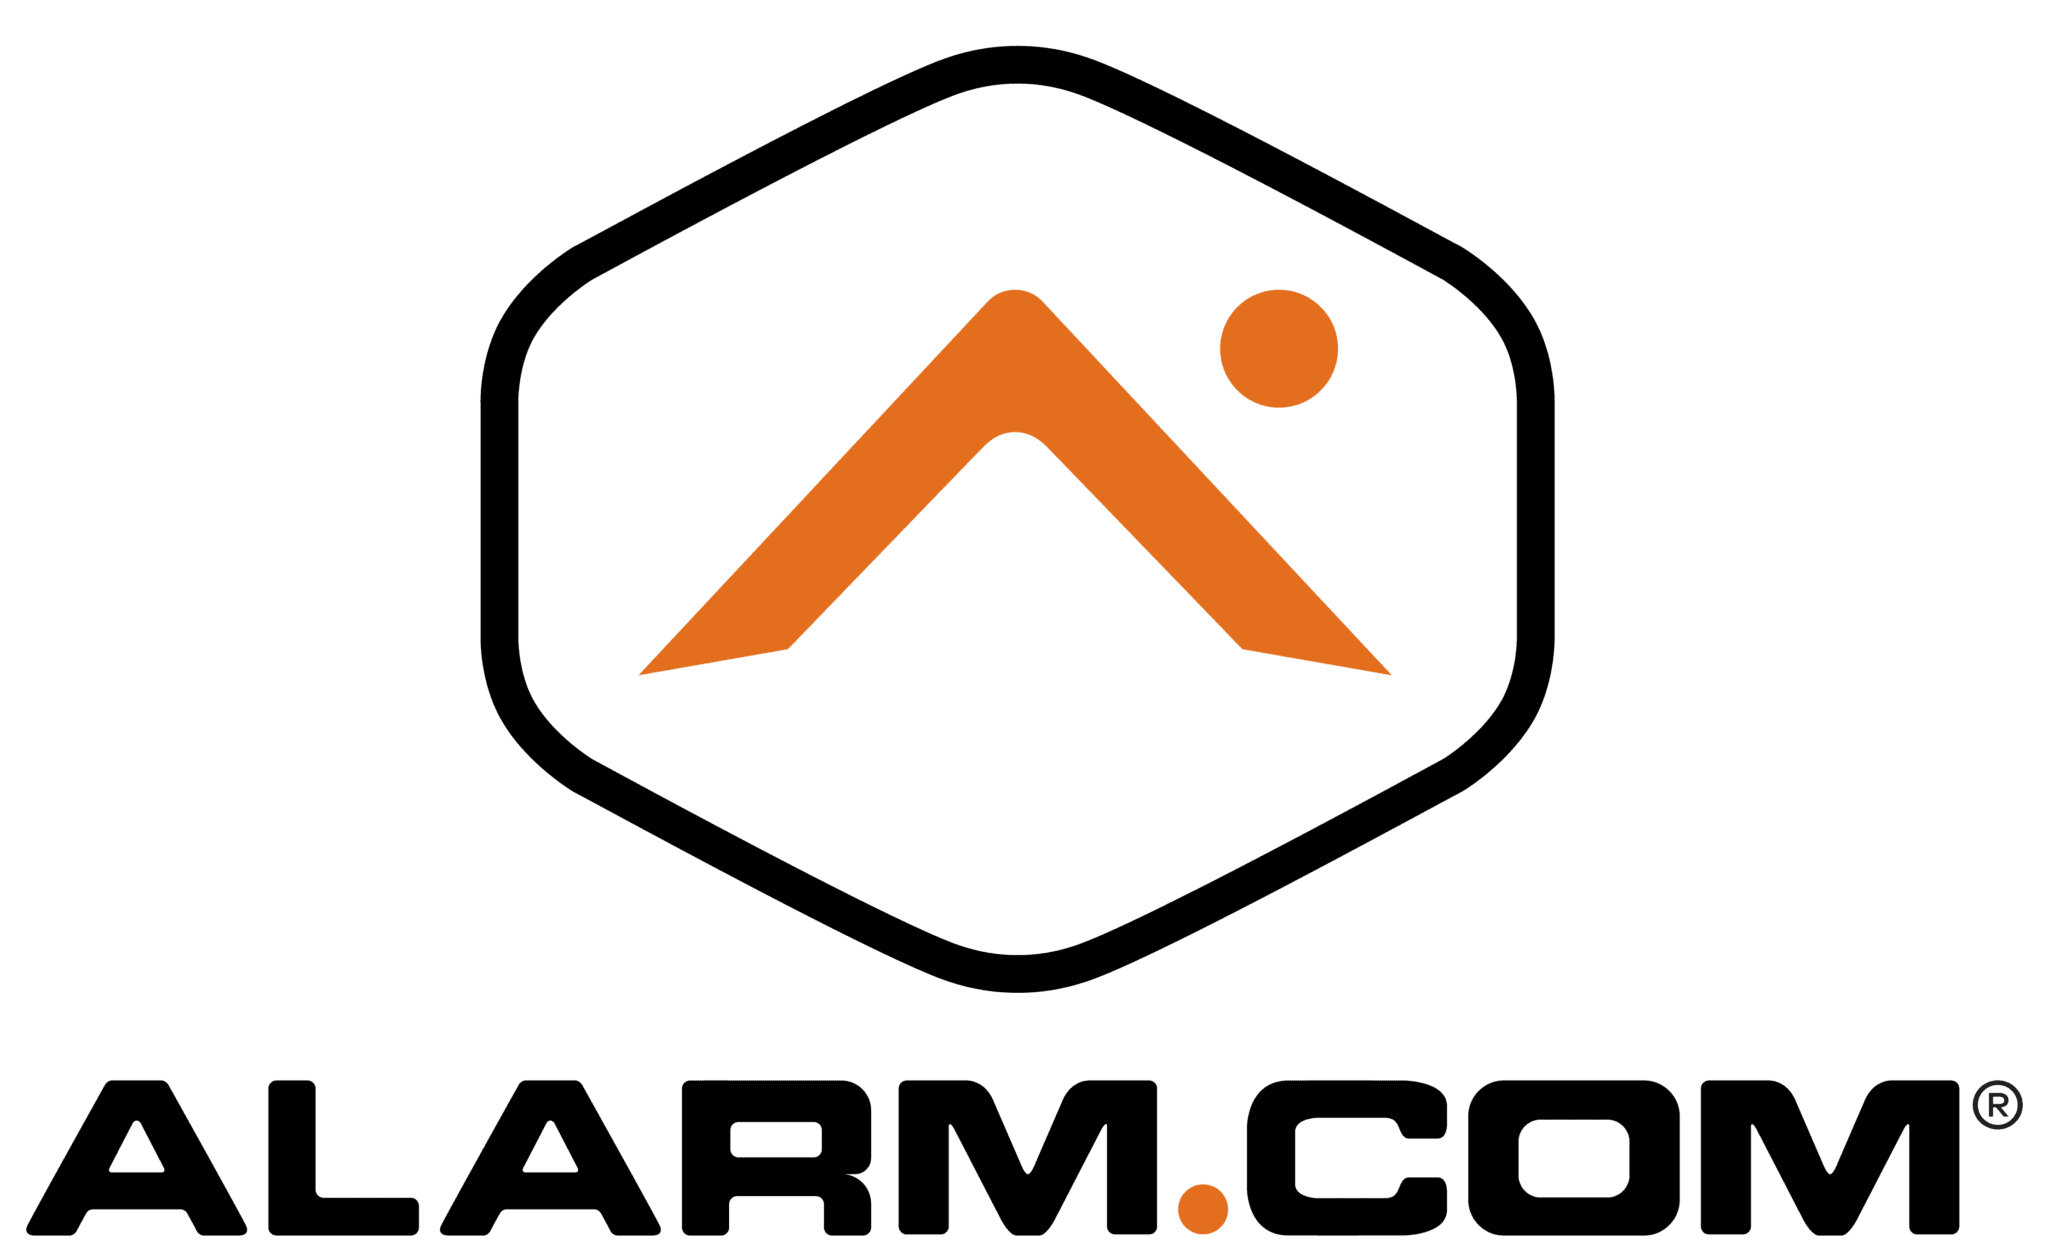 Alarm.com Logo San Antonio Home Security